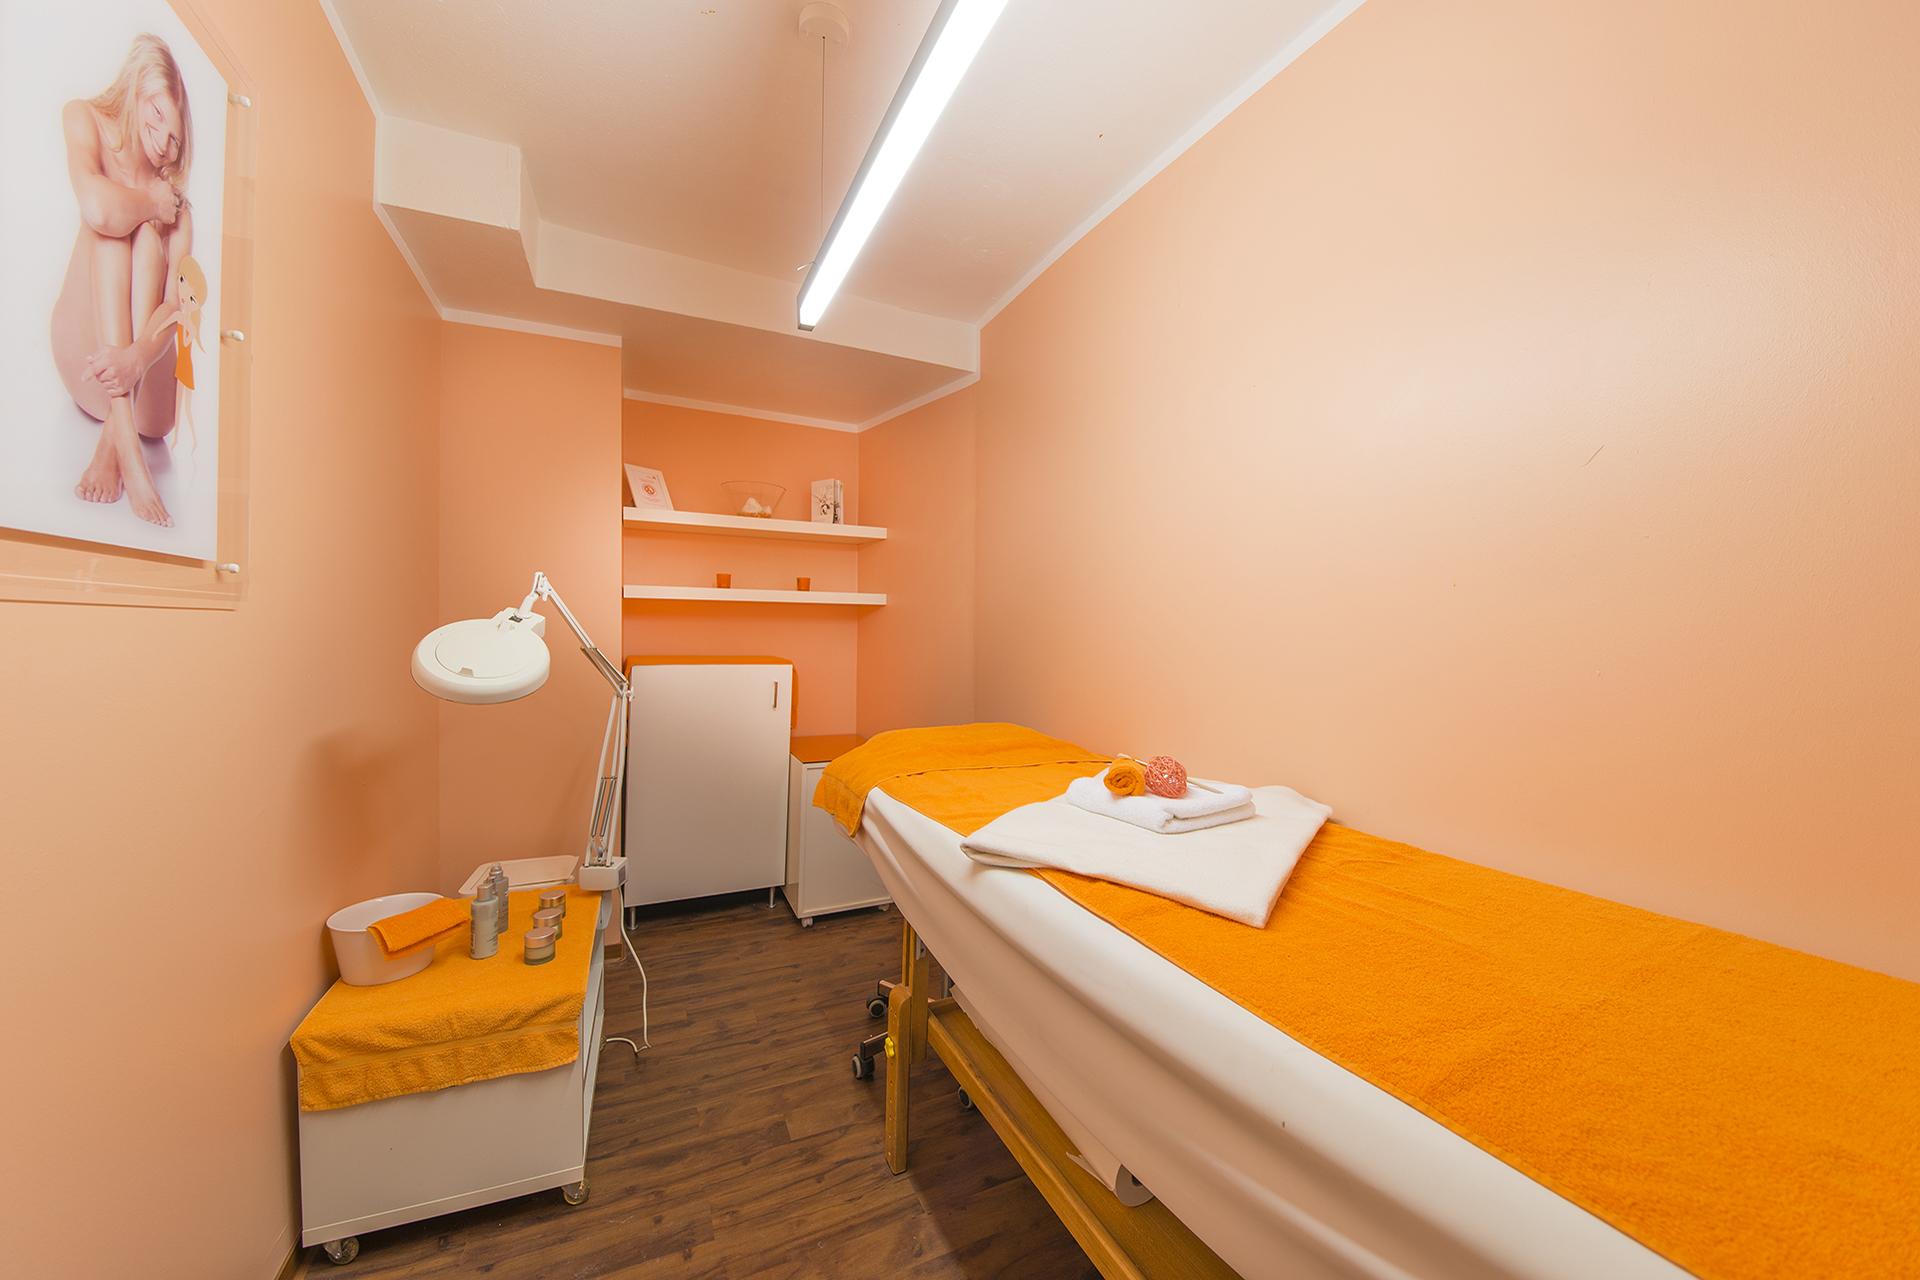 ➤ Senzera GmbH Waxing, Sugaring & Kosmetikstudio in Bochum 4